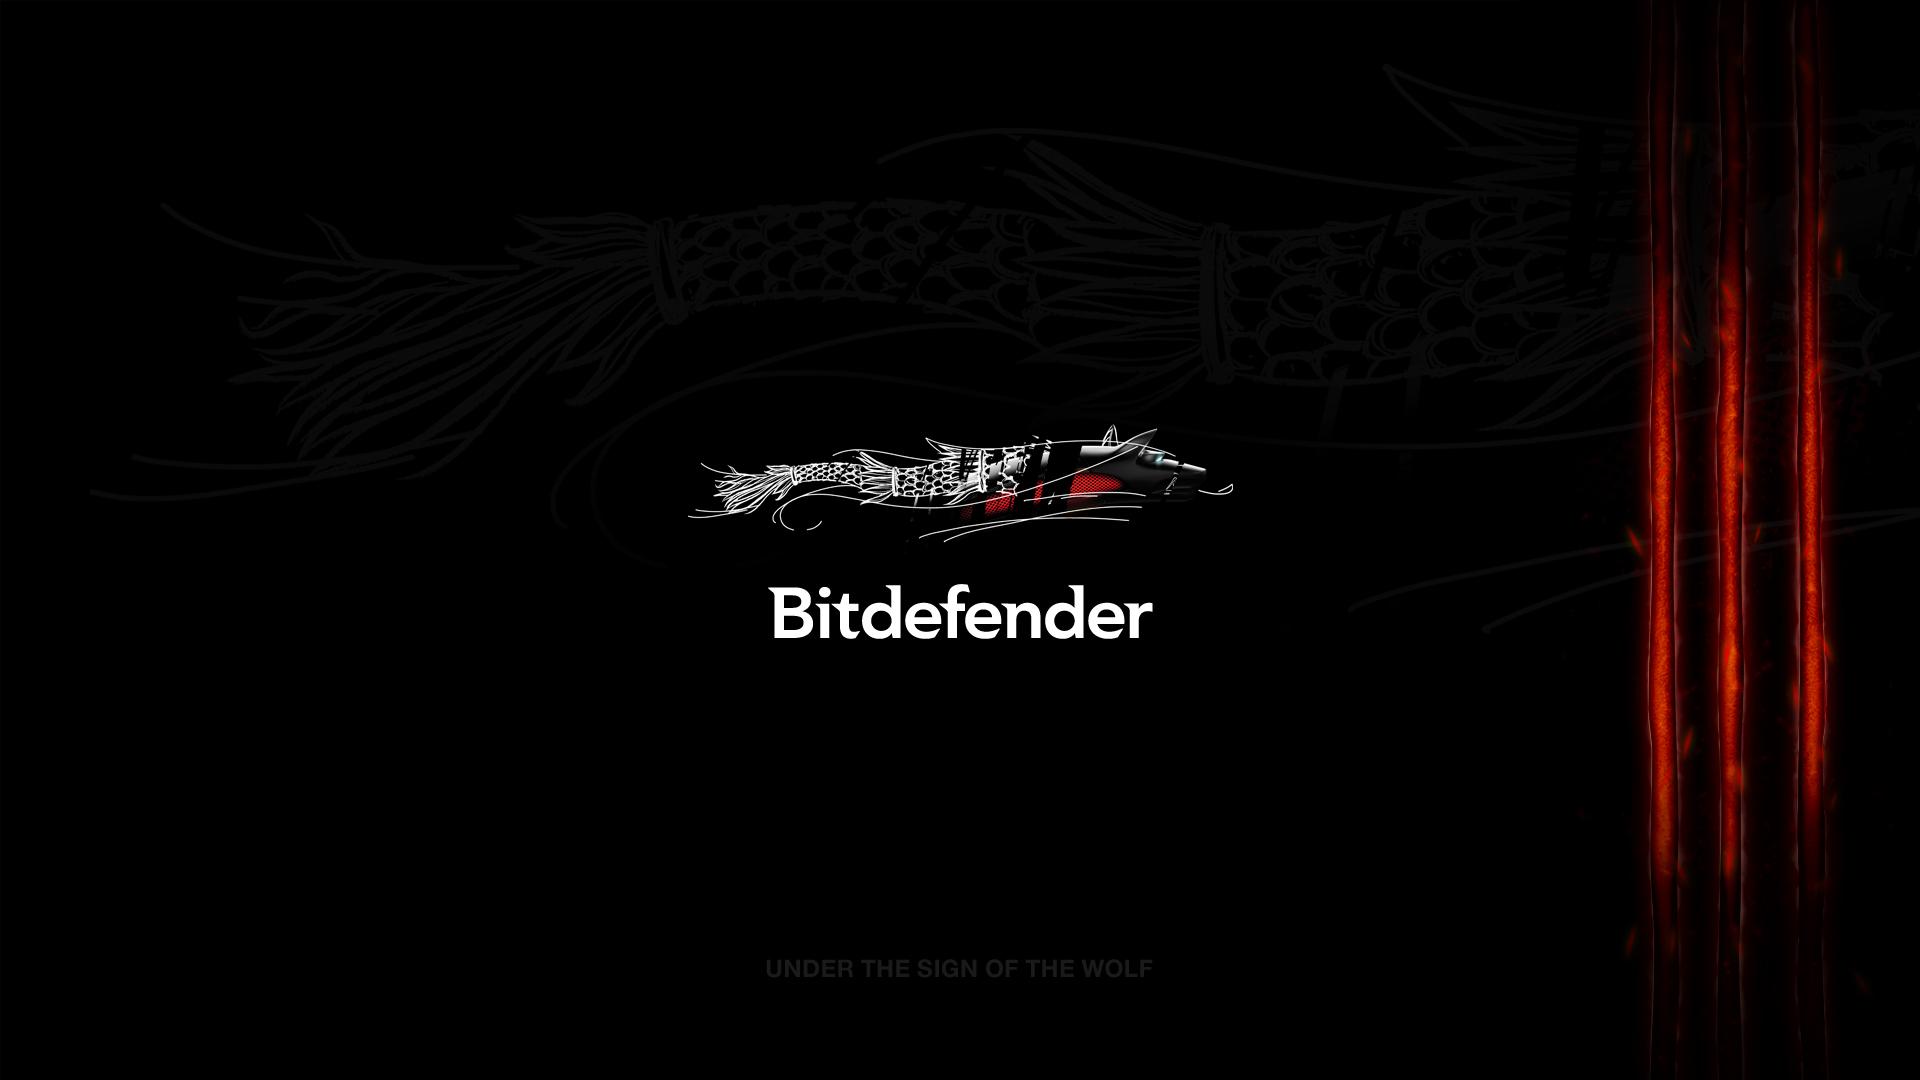 Bitdefender Wallpapers 4USkYcom 1920x1080